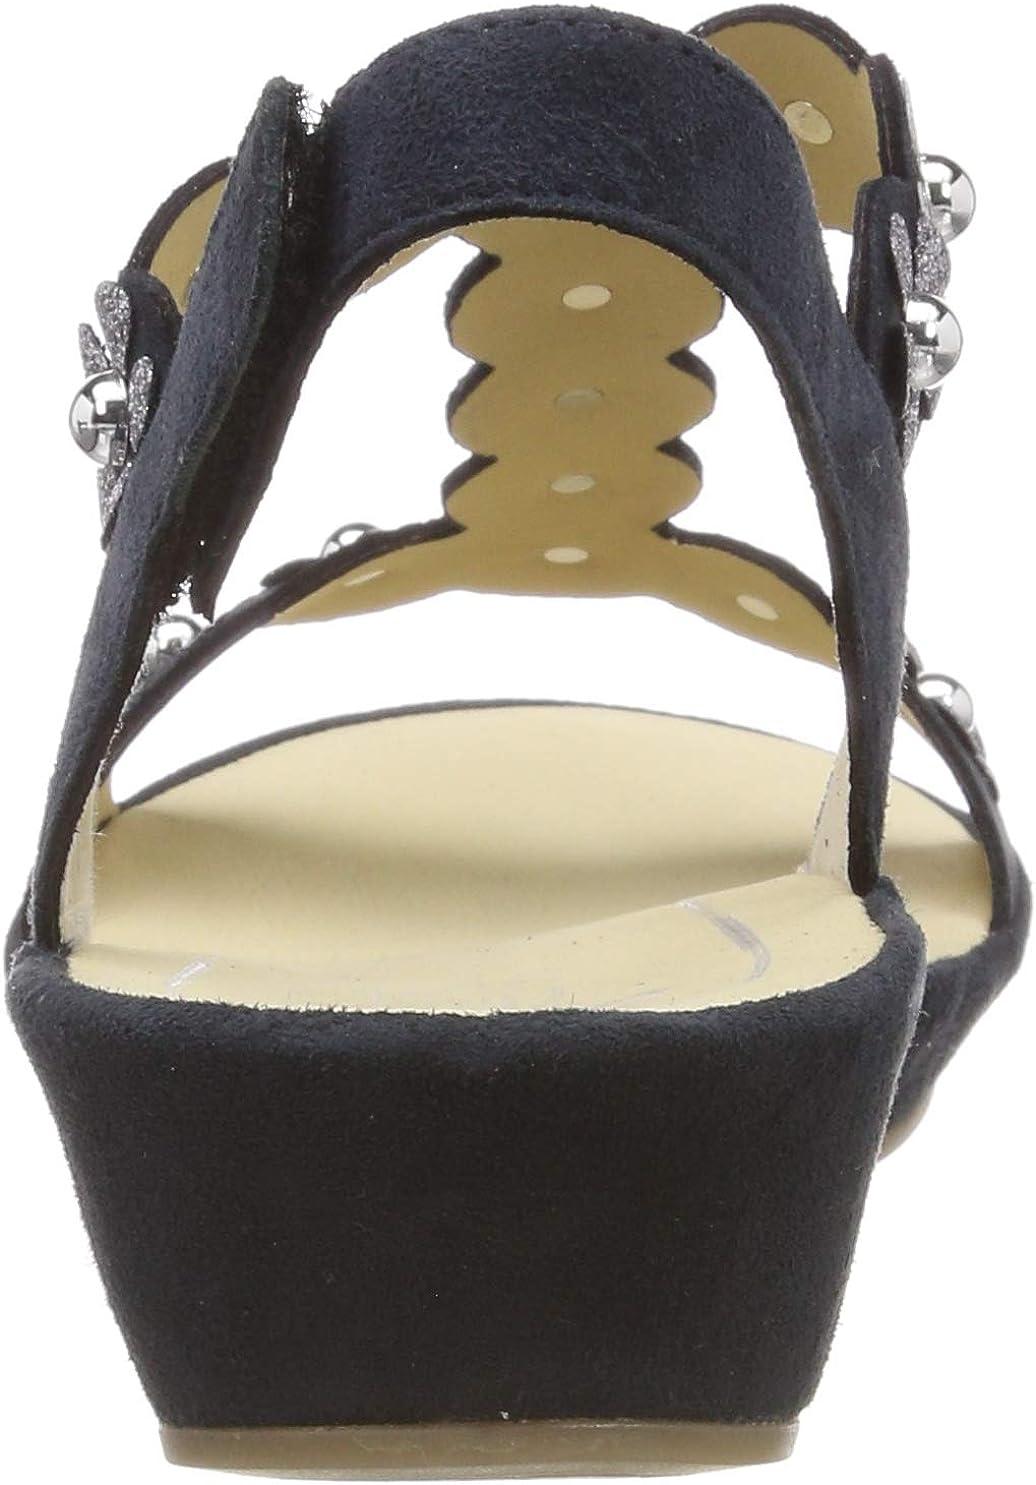 ARA Womens T-bar T-Bar Sandals